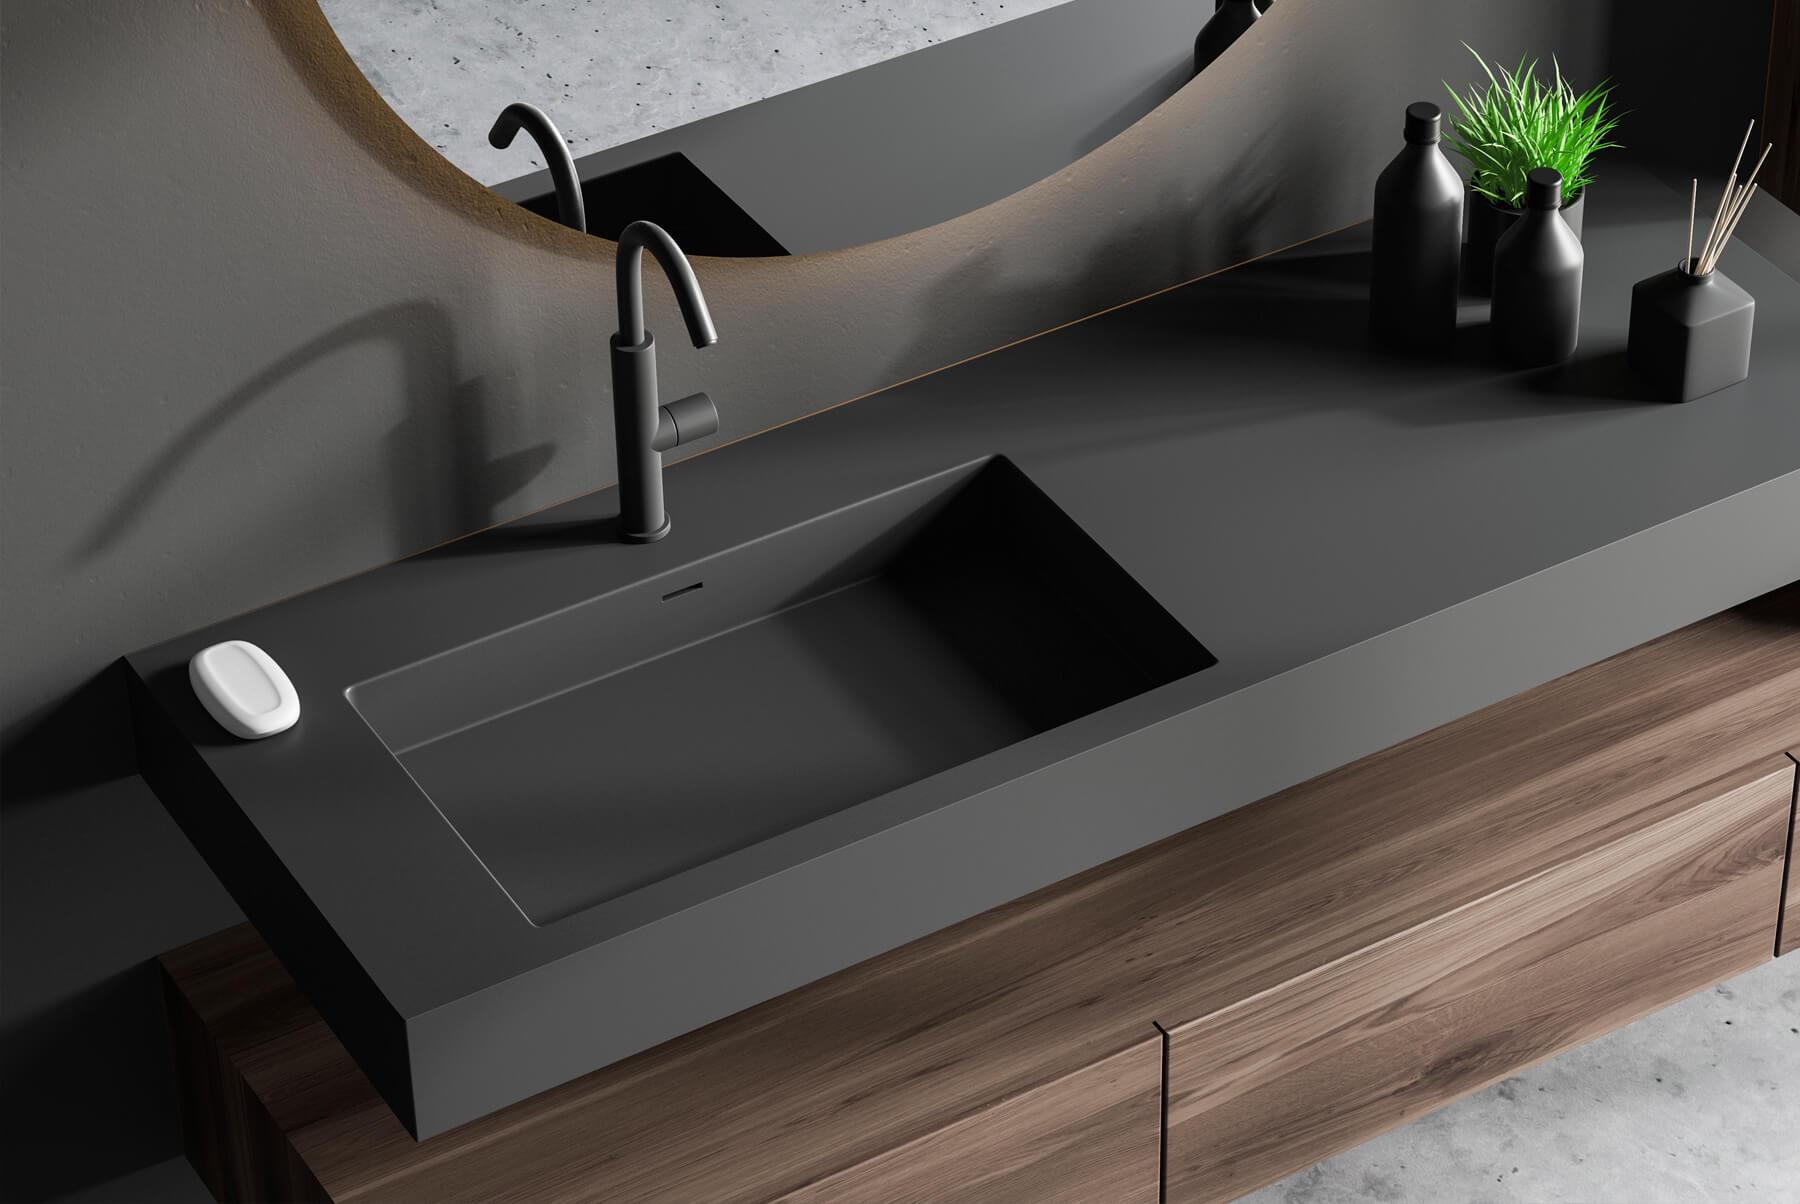 ARTESIAN-Concrete-Basin-inset-3-1800x1204